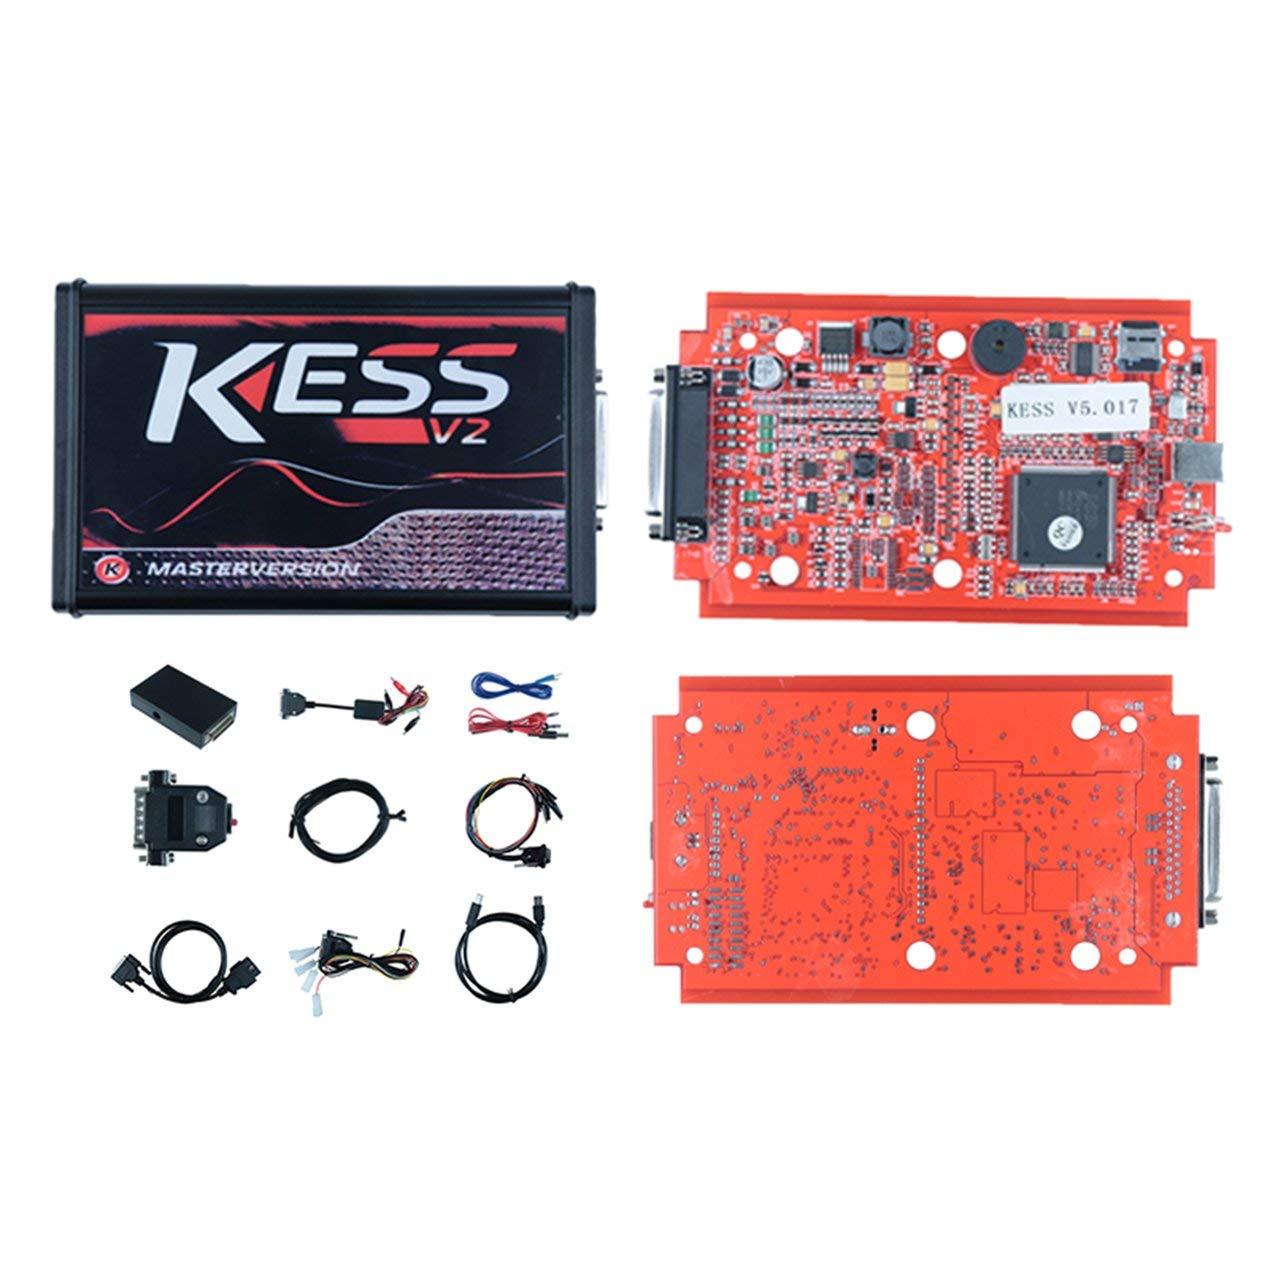 Vehicle Tools WA0069B KESS V2 5 017 Master Version No Token ECU